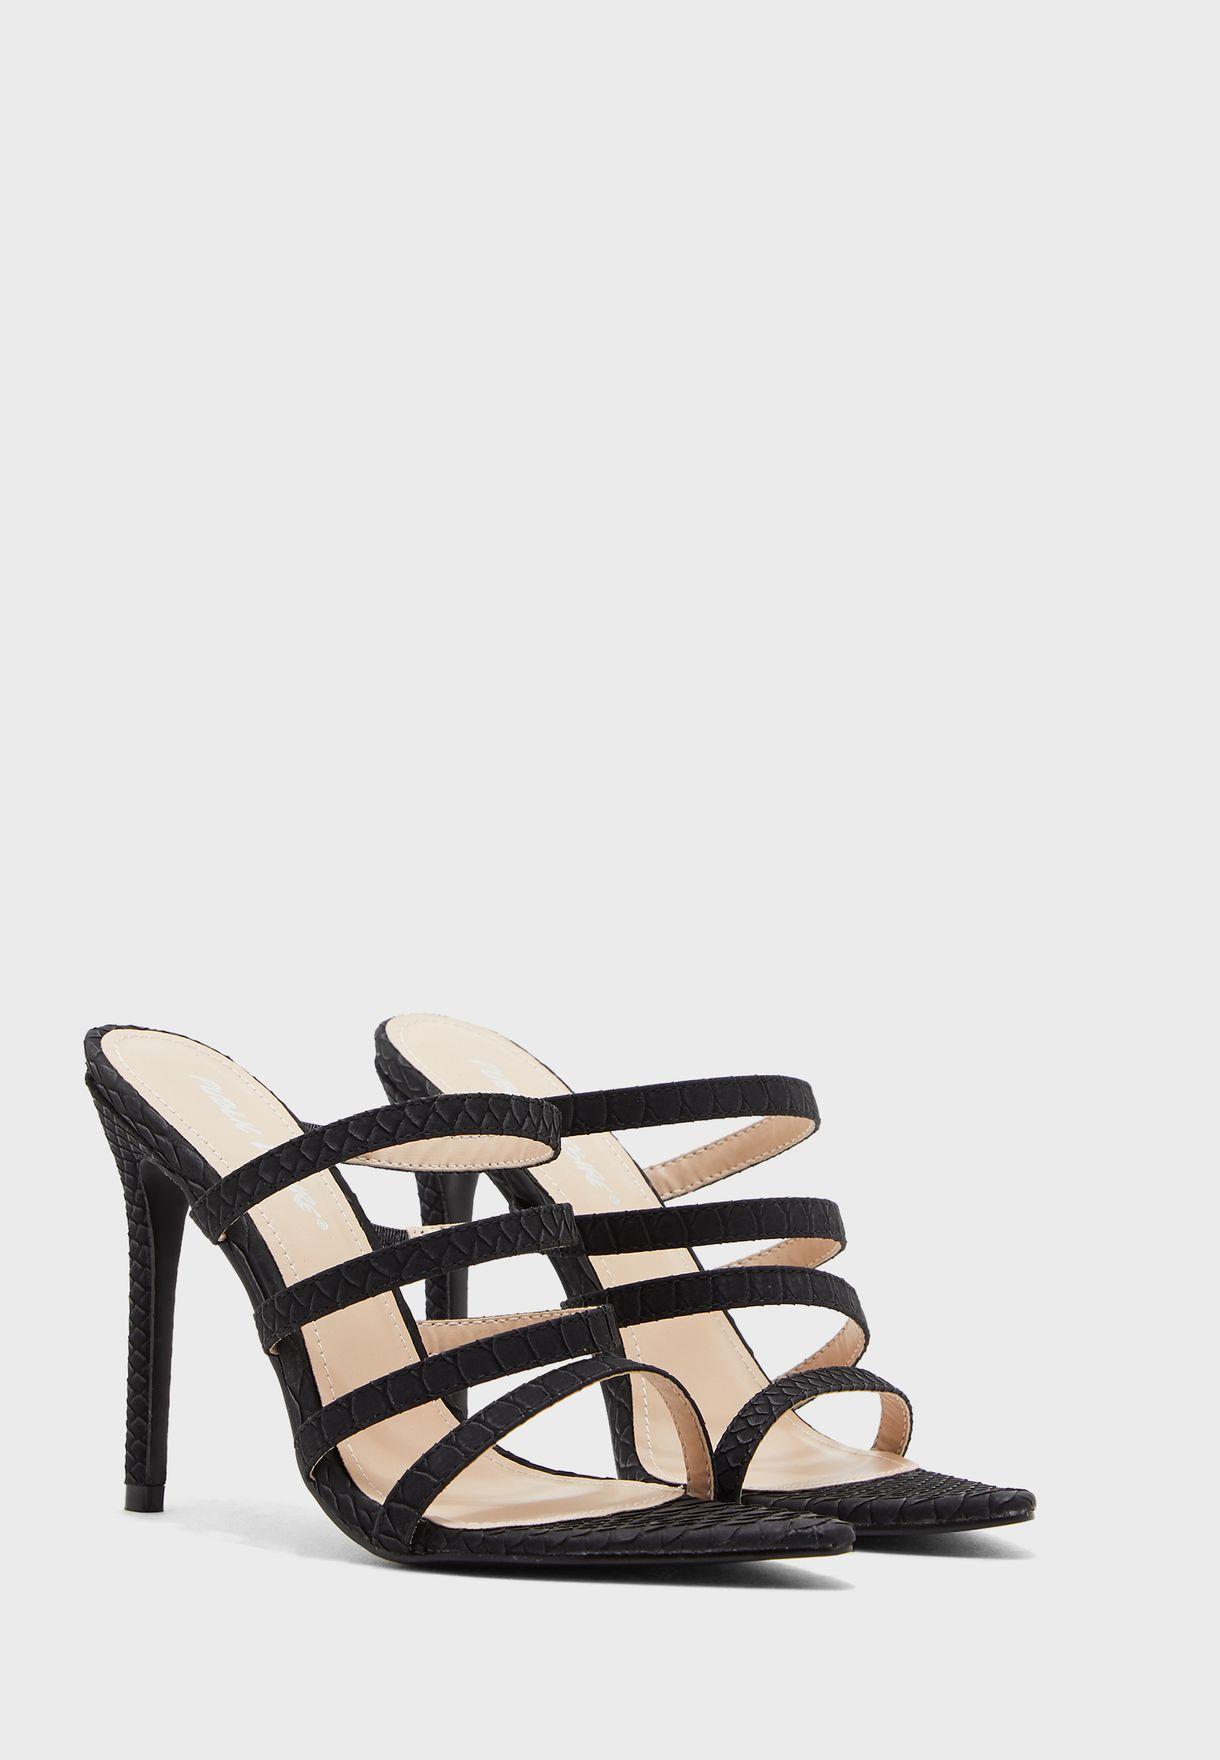 Confess Multi Strap Sandal - Black